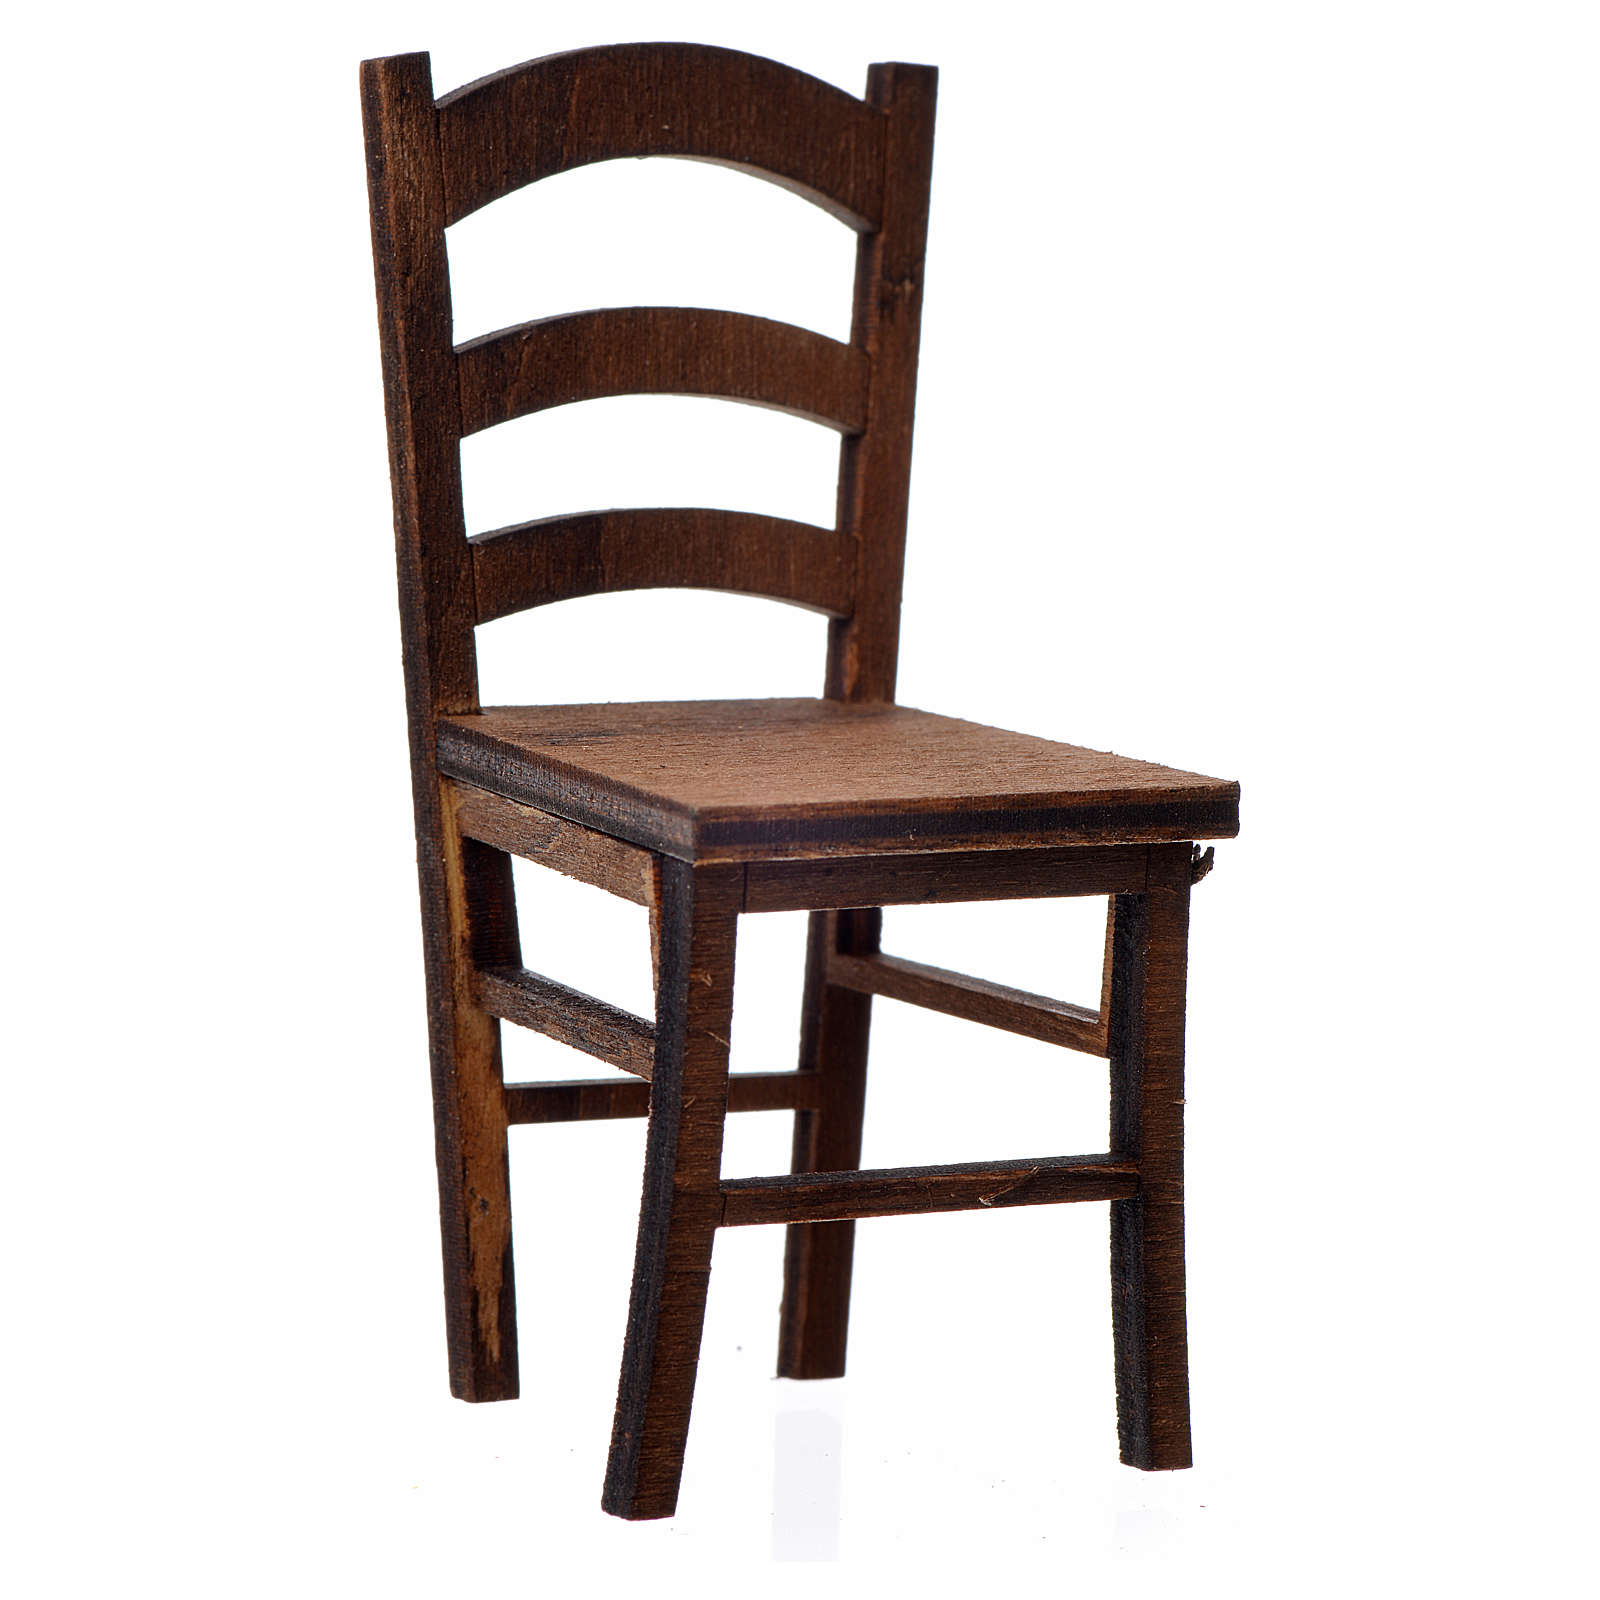 Nativity accessory, wooden chair 7.5x3.5x3.5cm 4